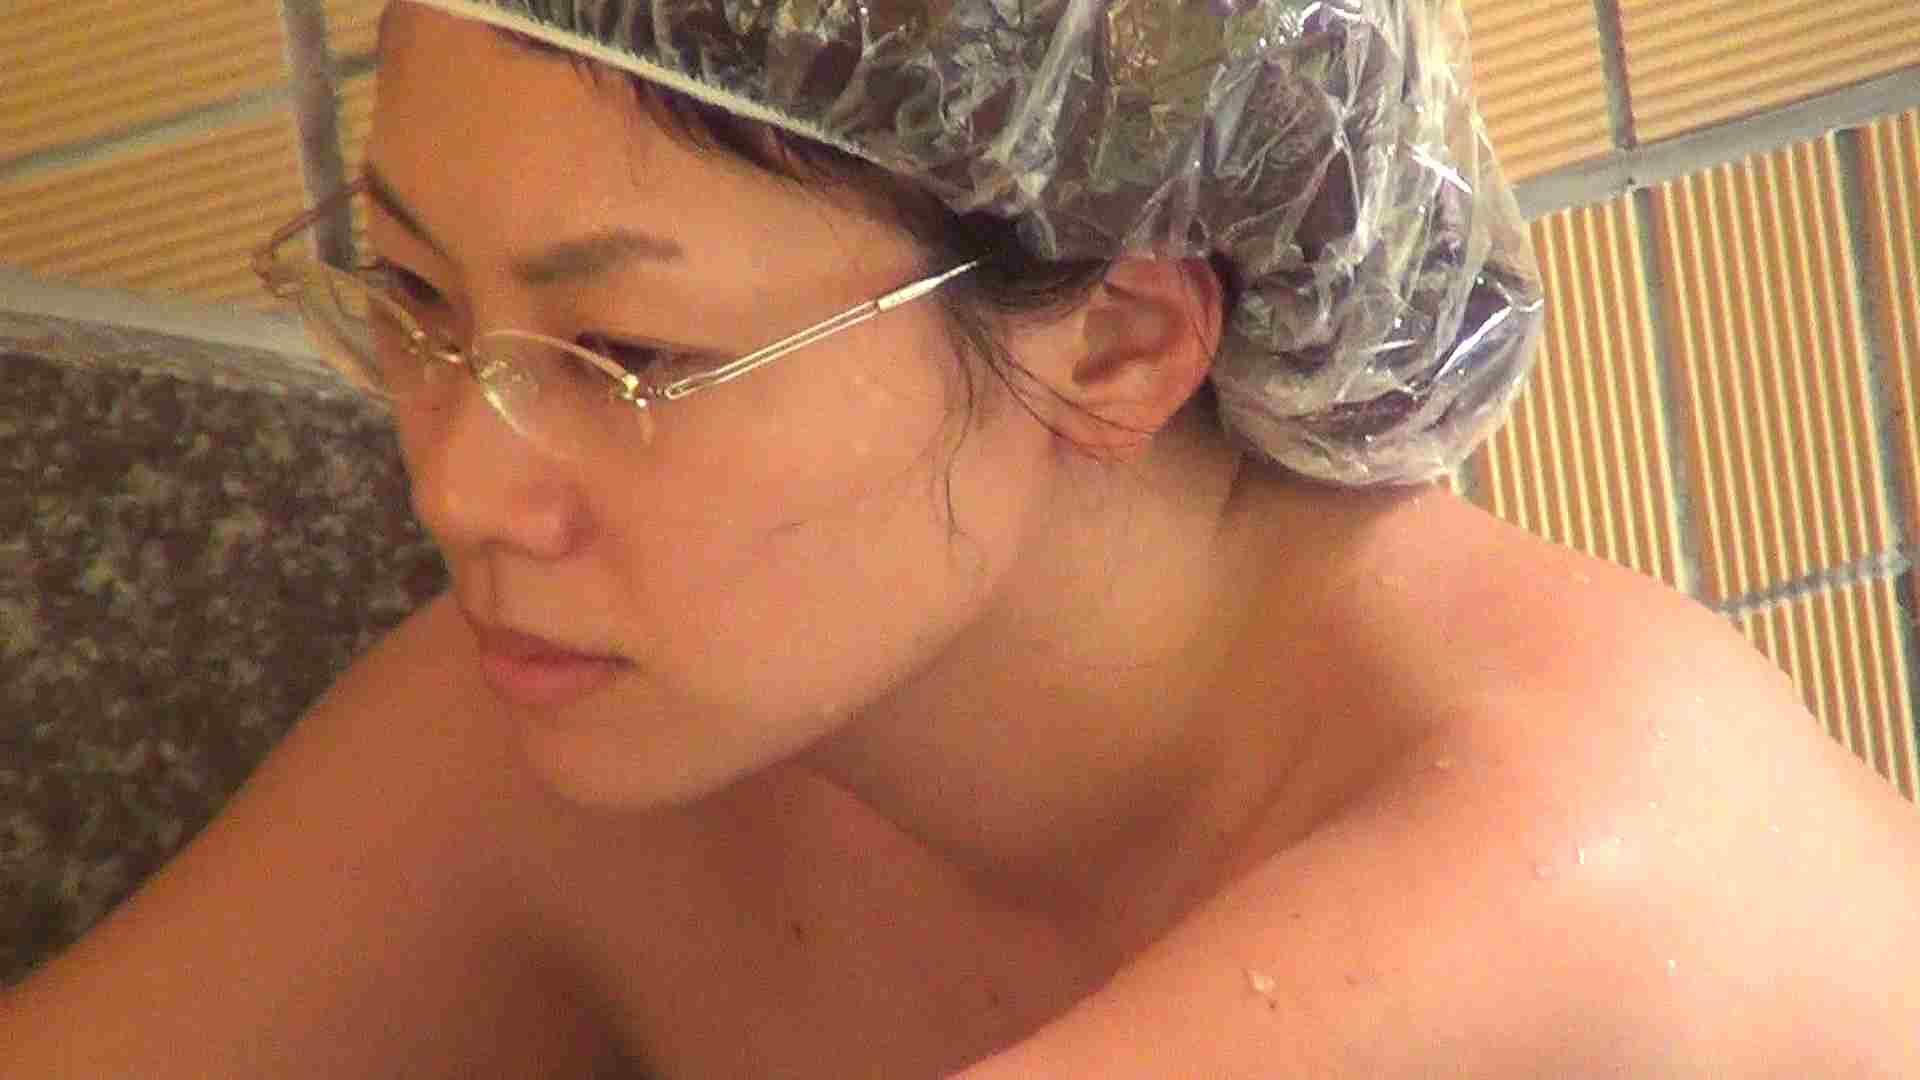 Aquaな露天風呂Vol.280 OLセックス  91画像 18